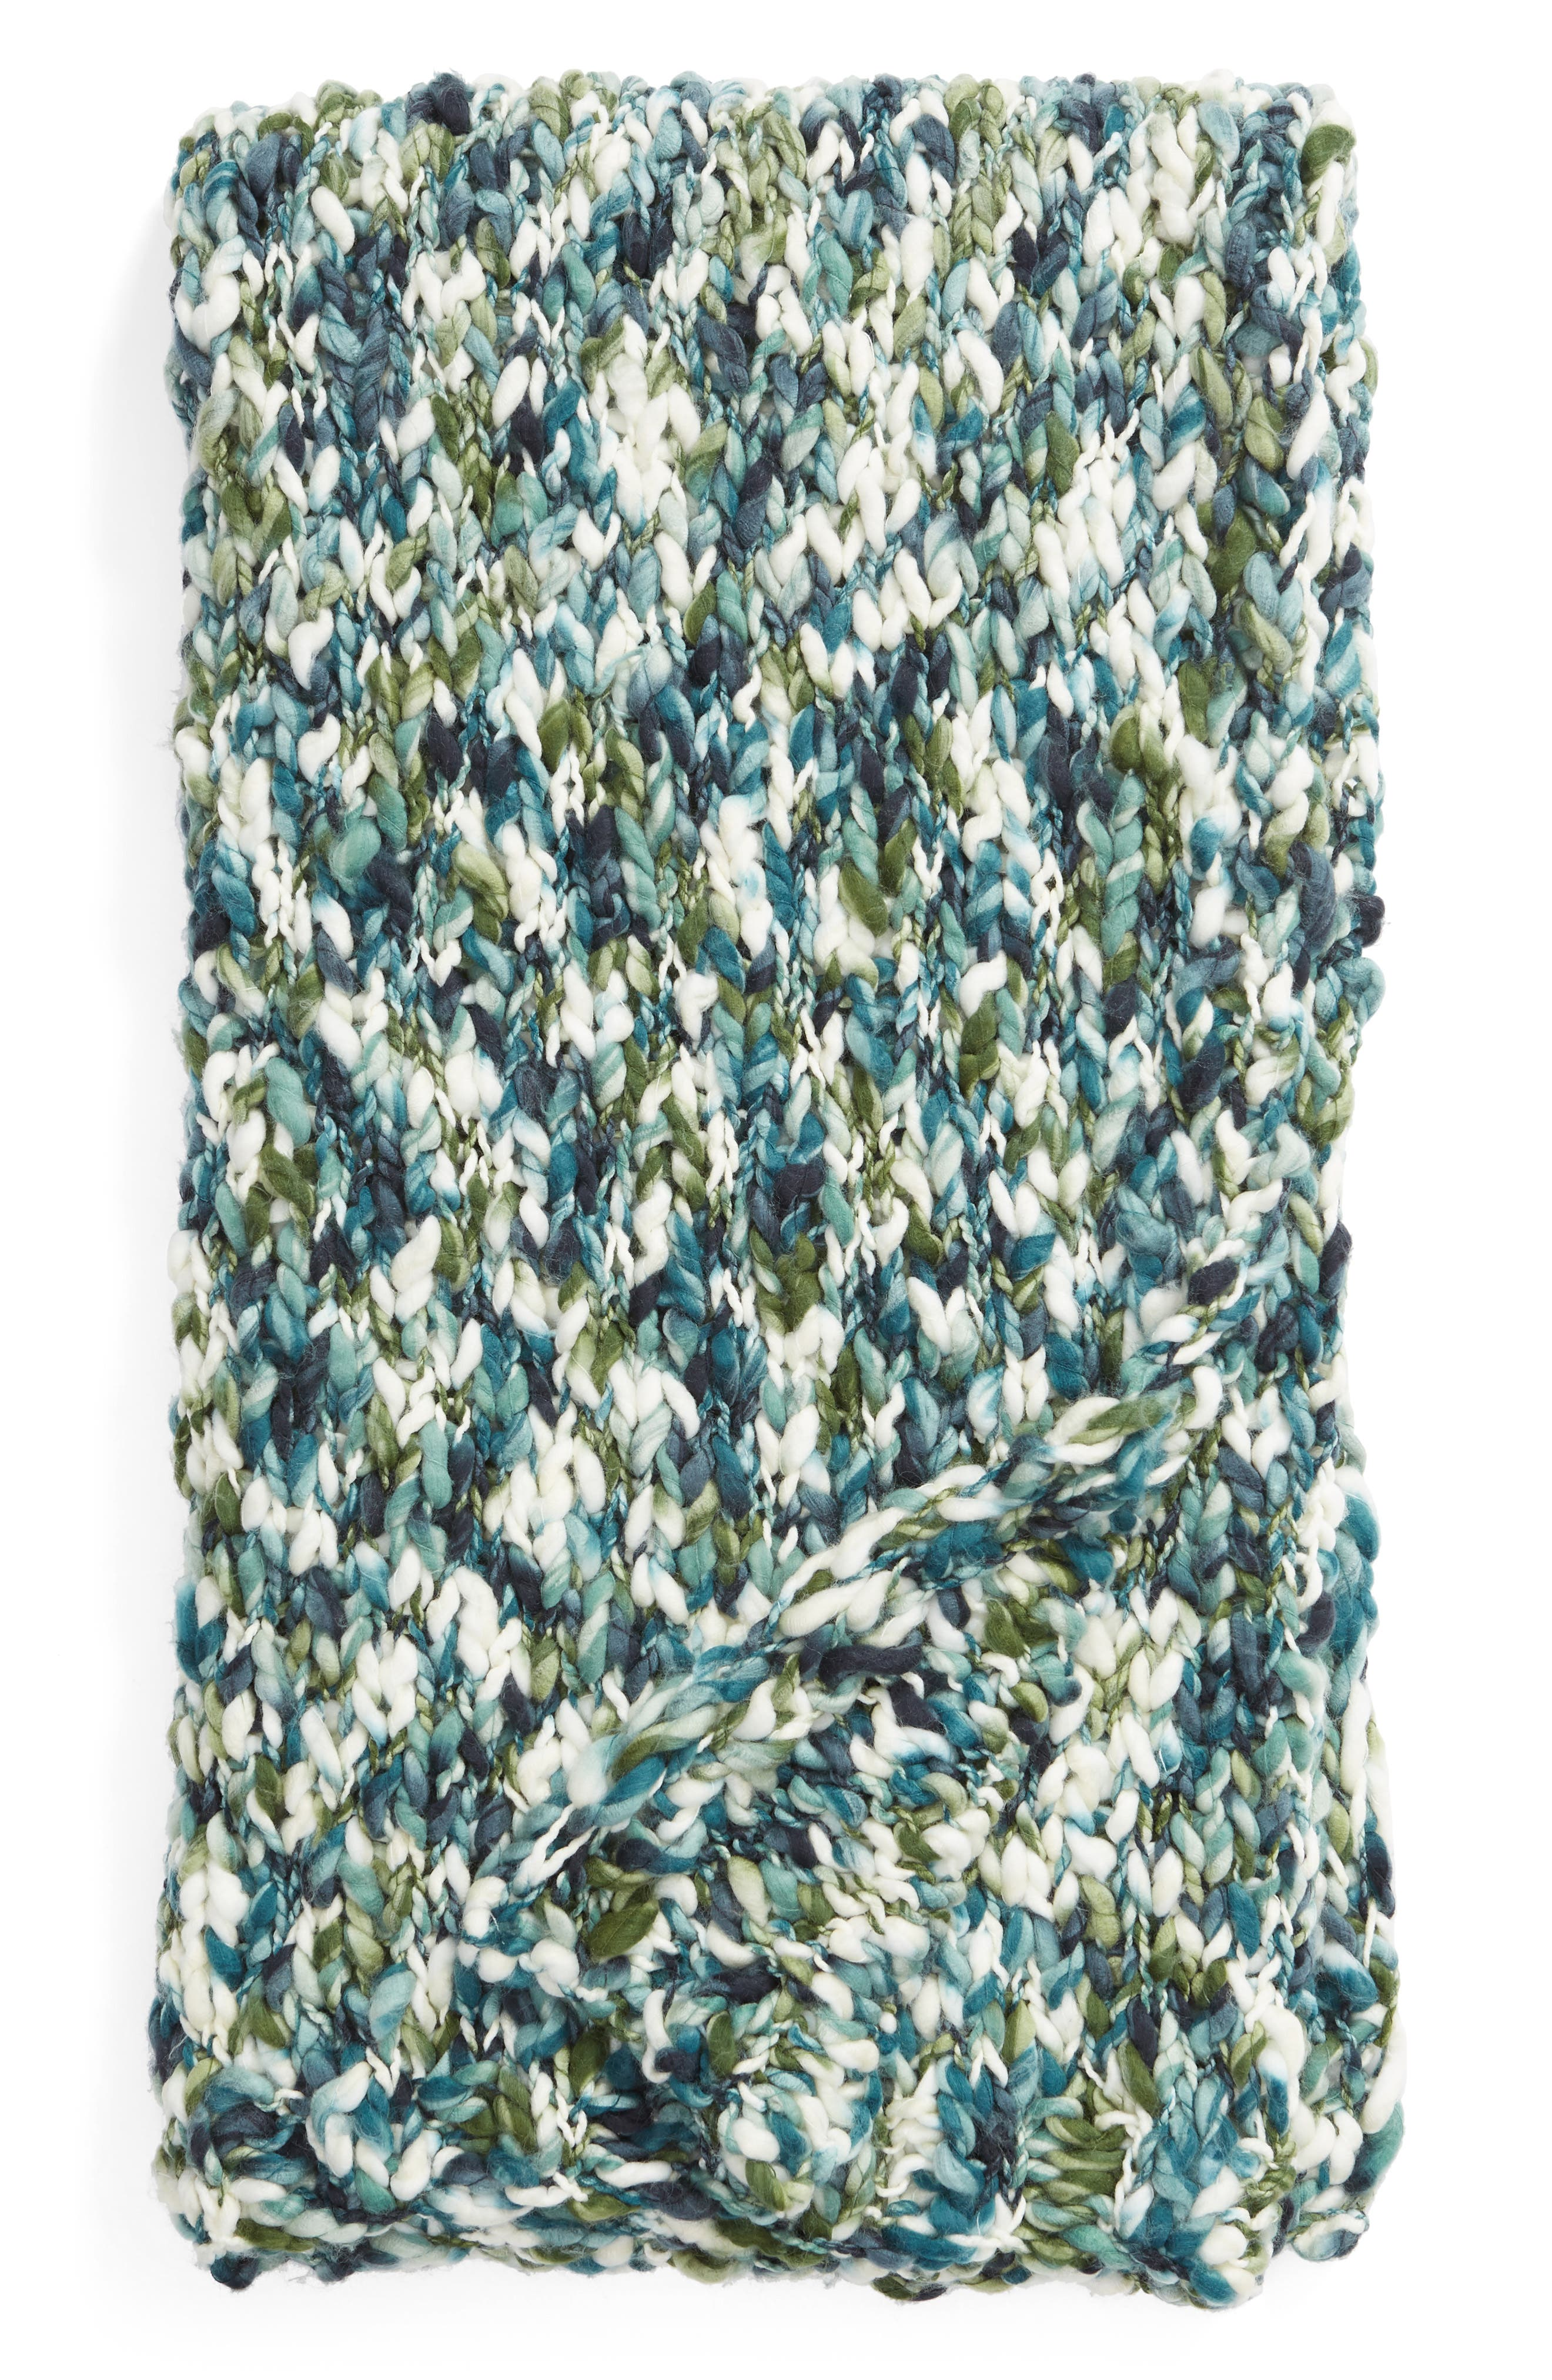 Knit Throw, Main, color, GREEN SHORE MULTI